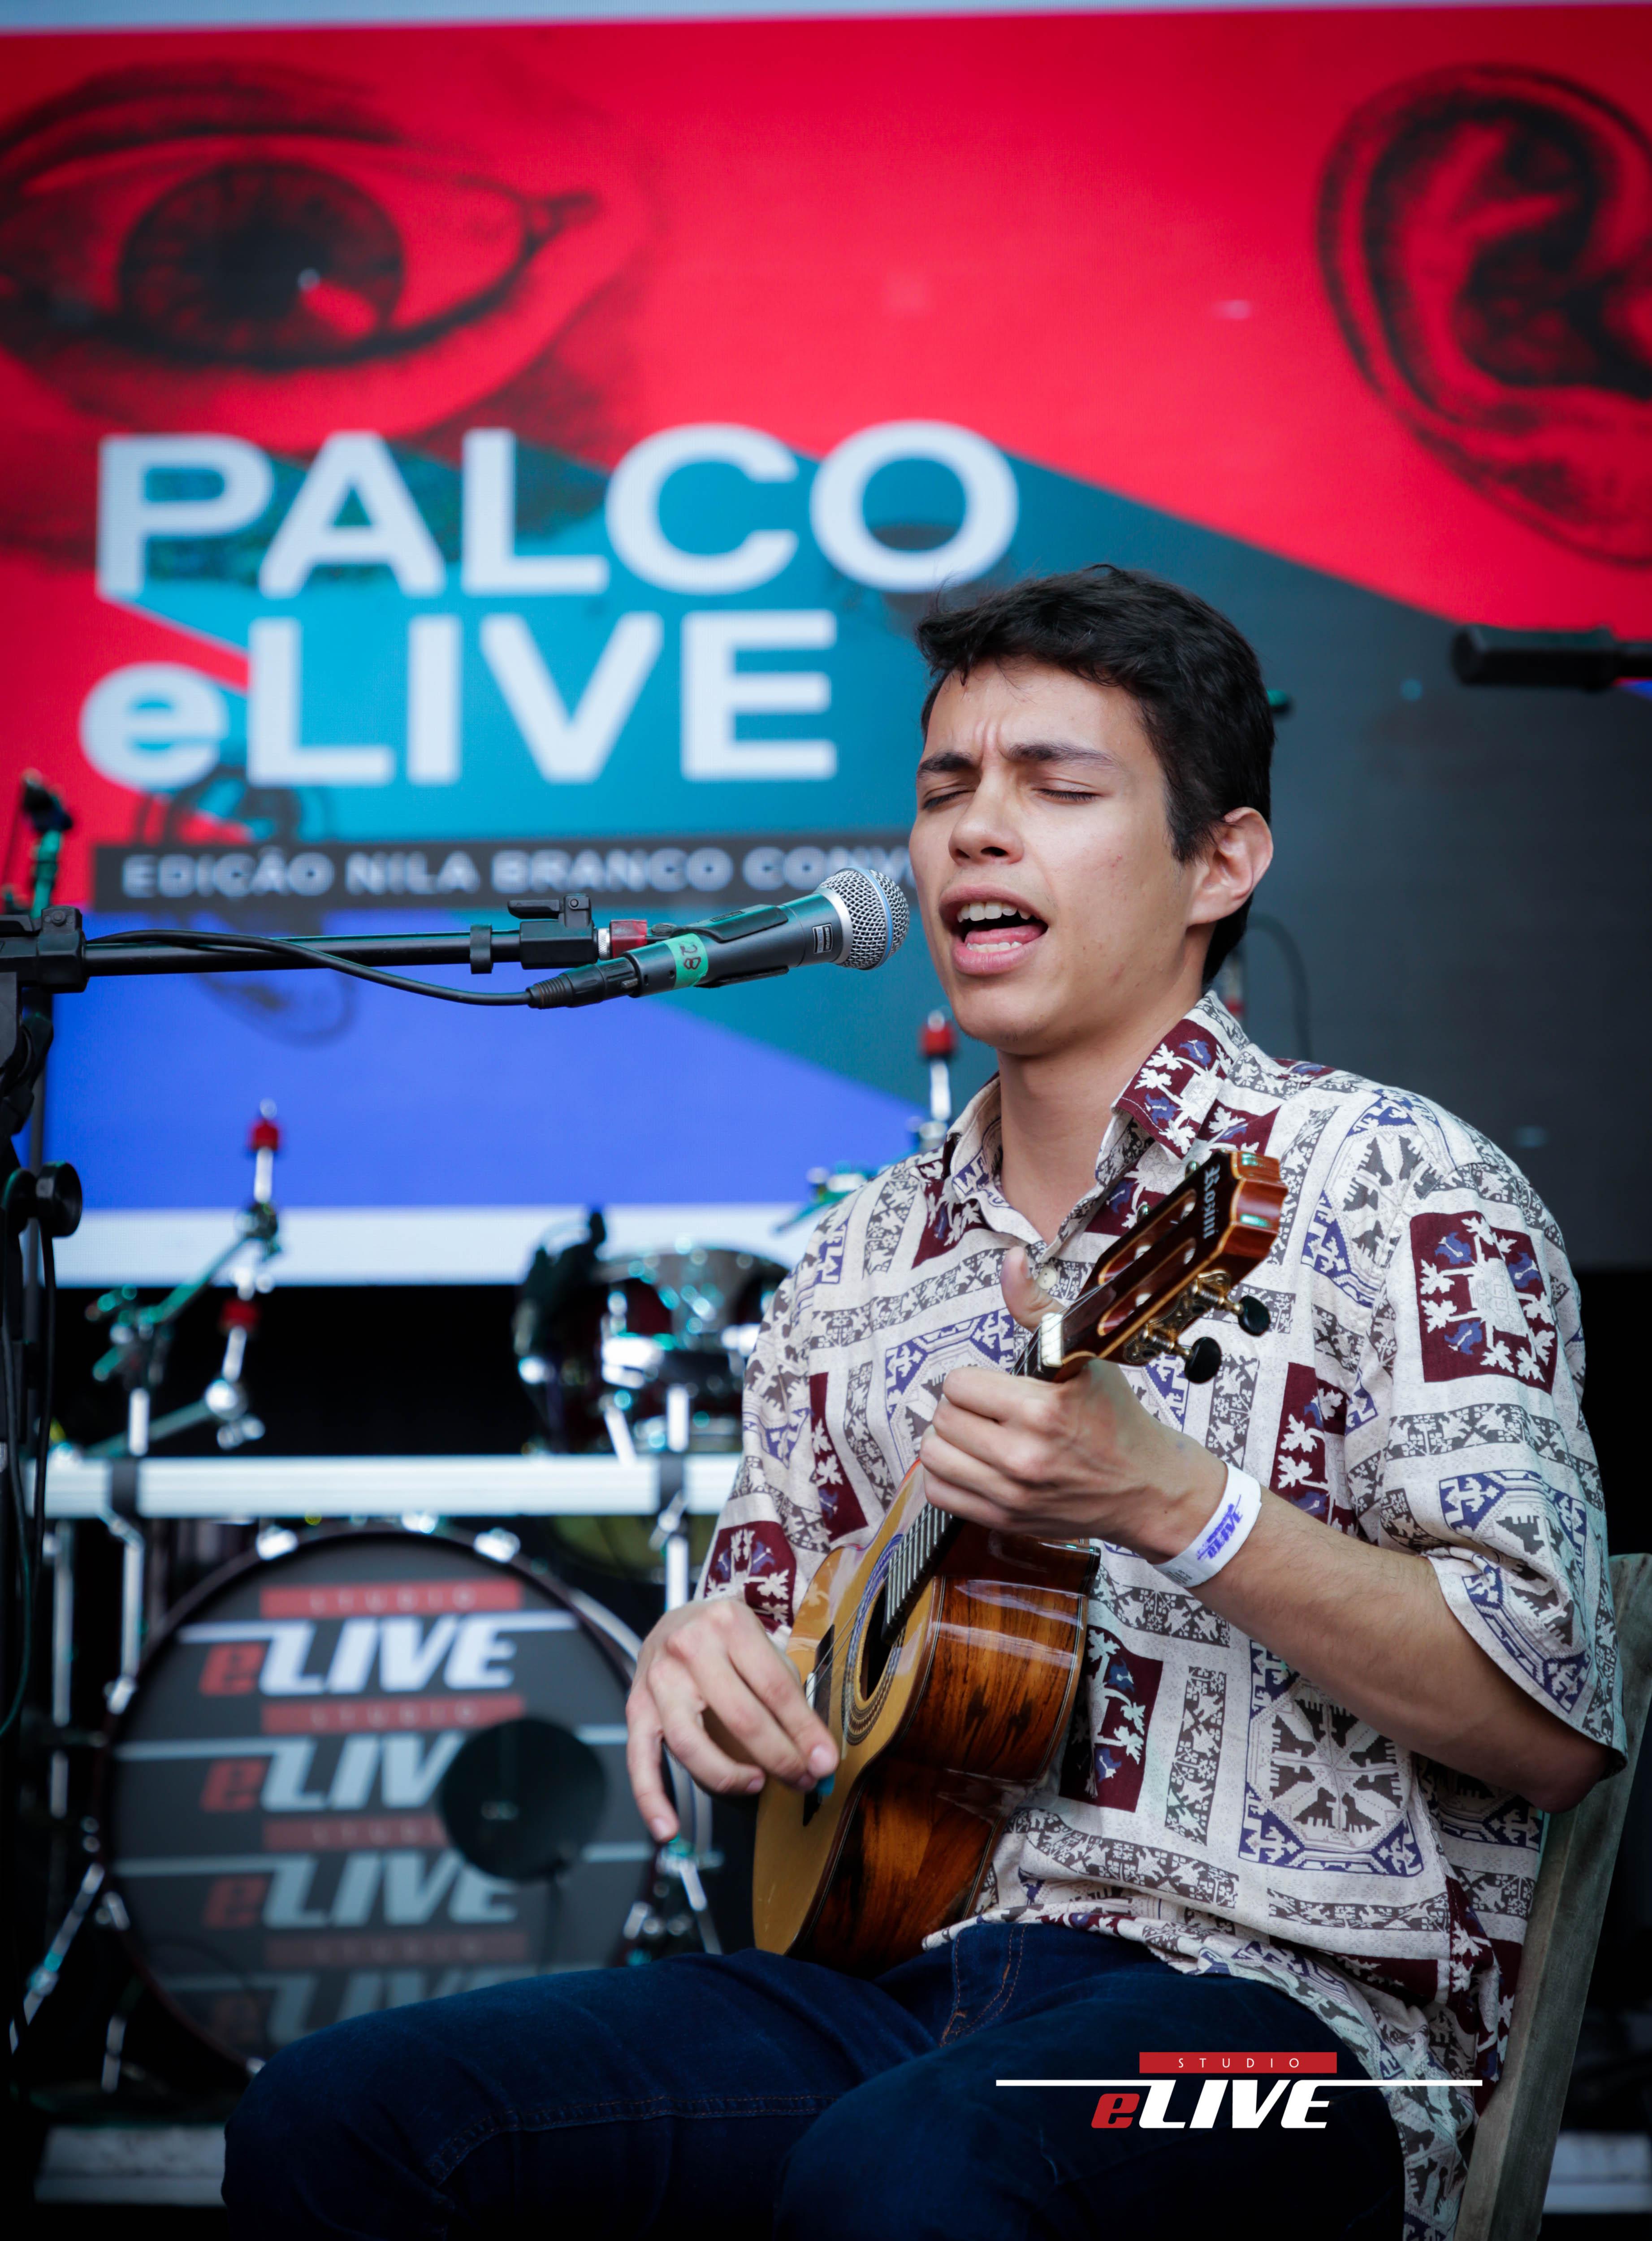 Festival Palco eLive